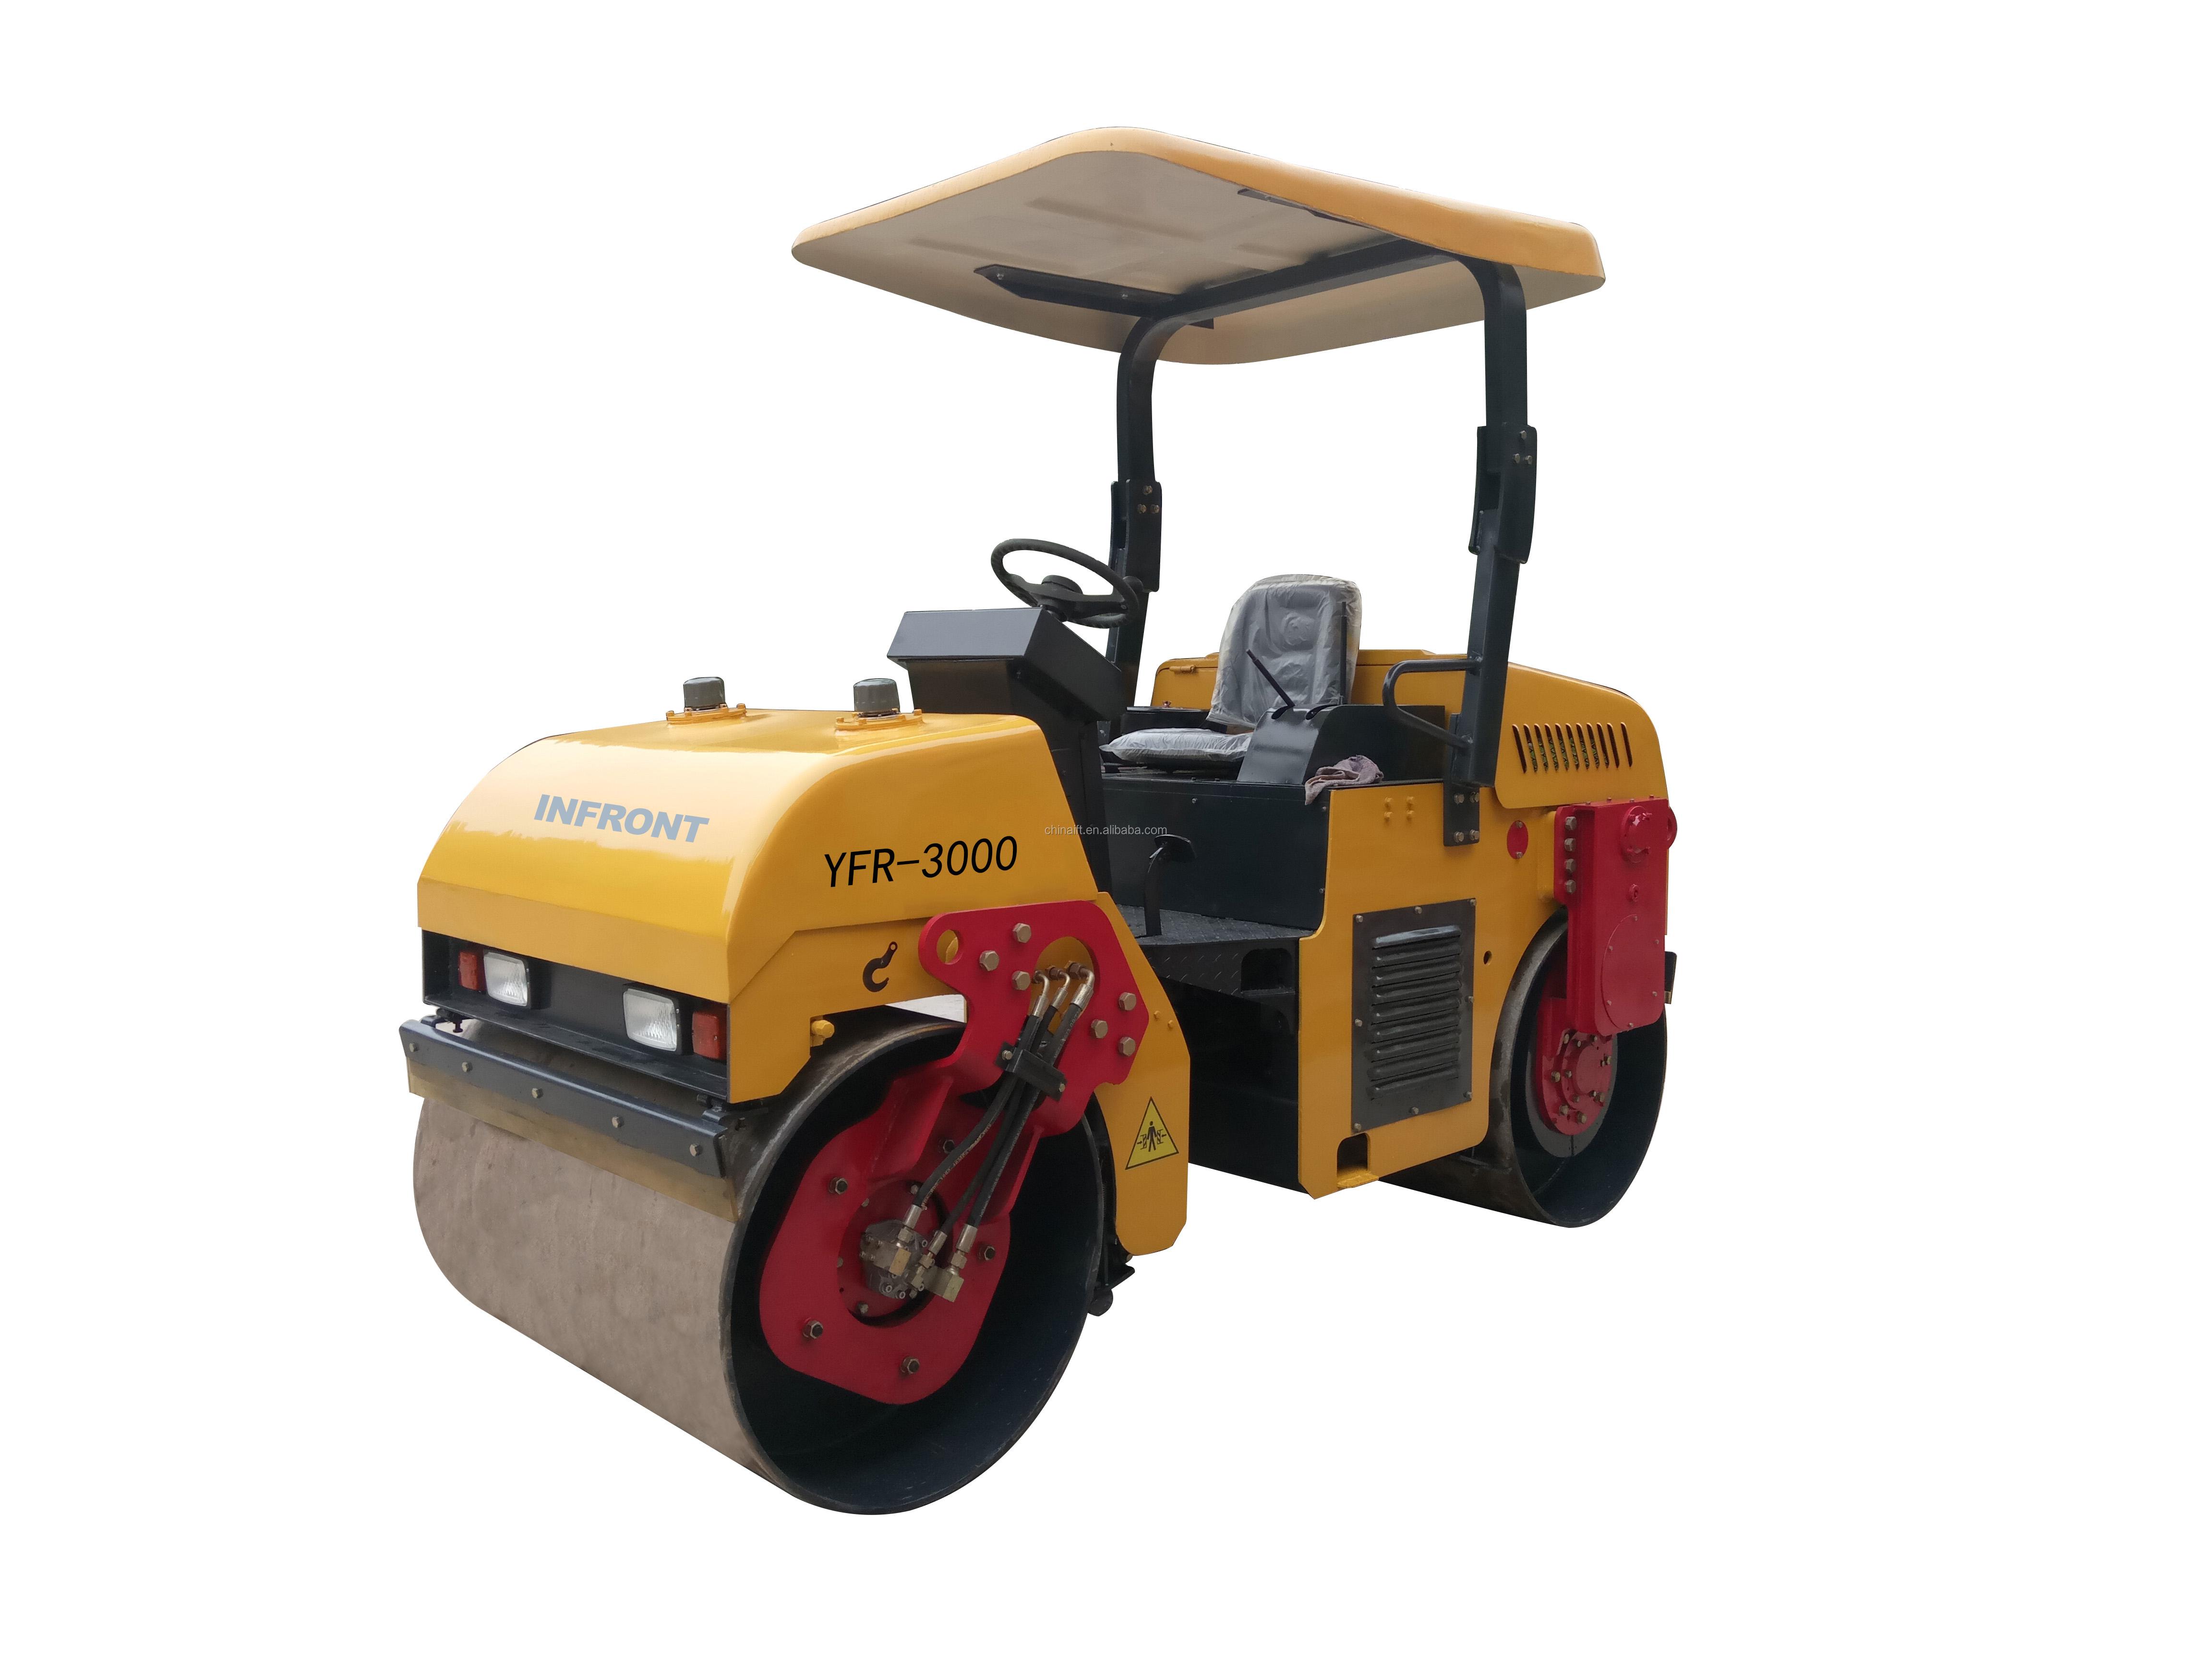 YFR-3000 3 ton double drum road roller compactor